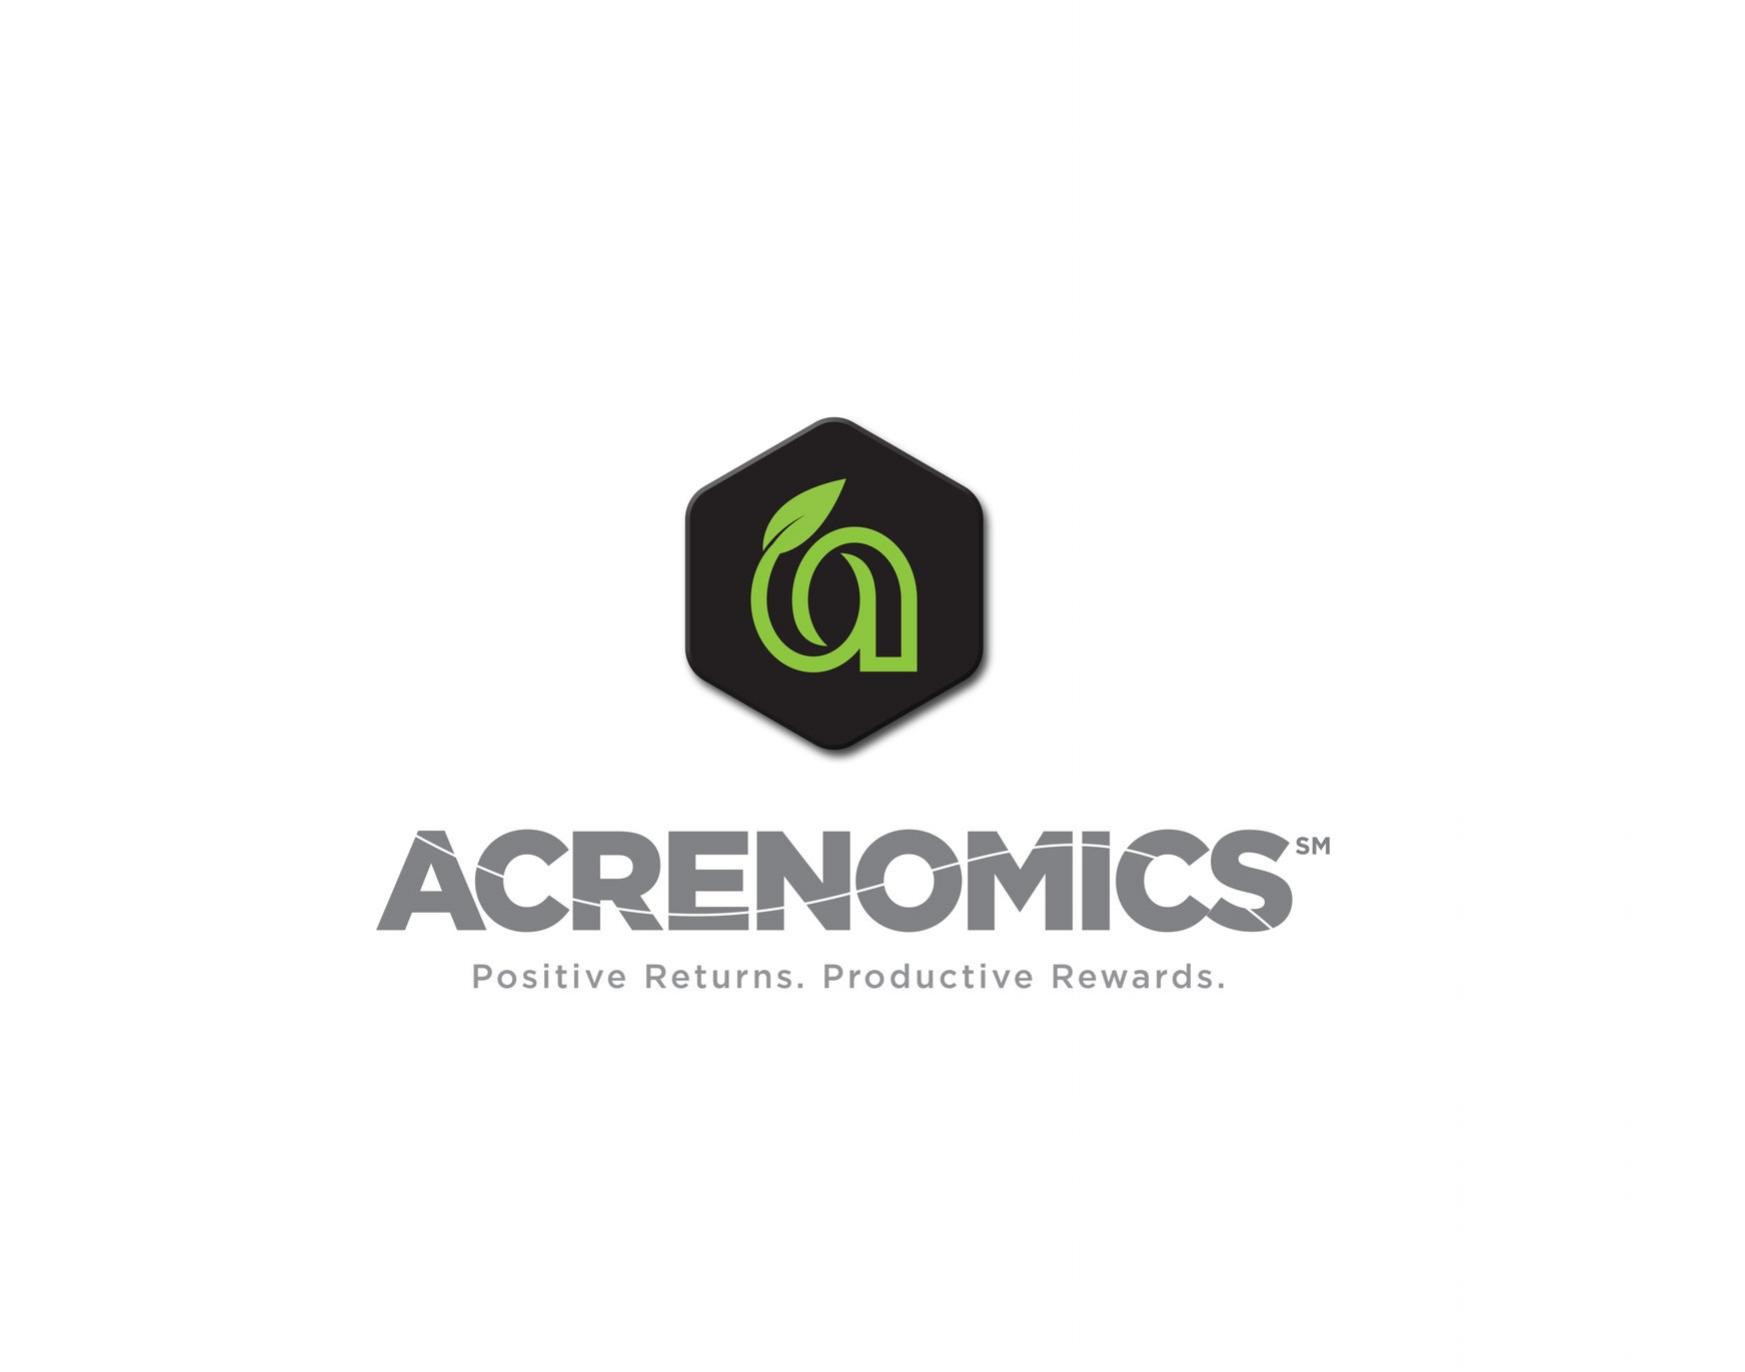 Acrenomics is part of CHS brand